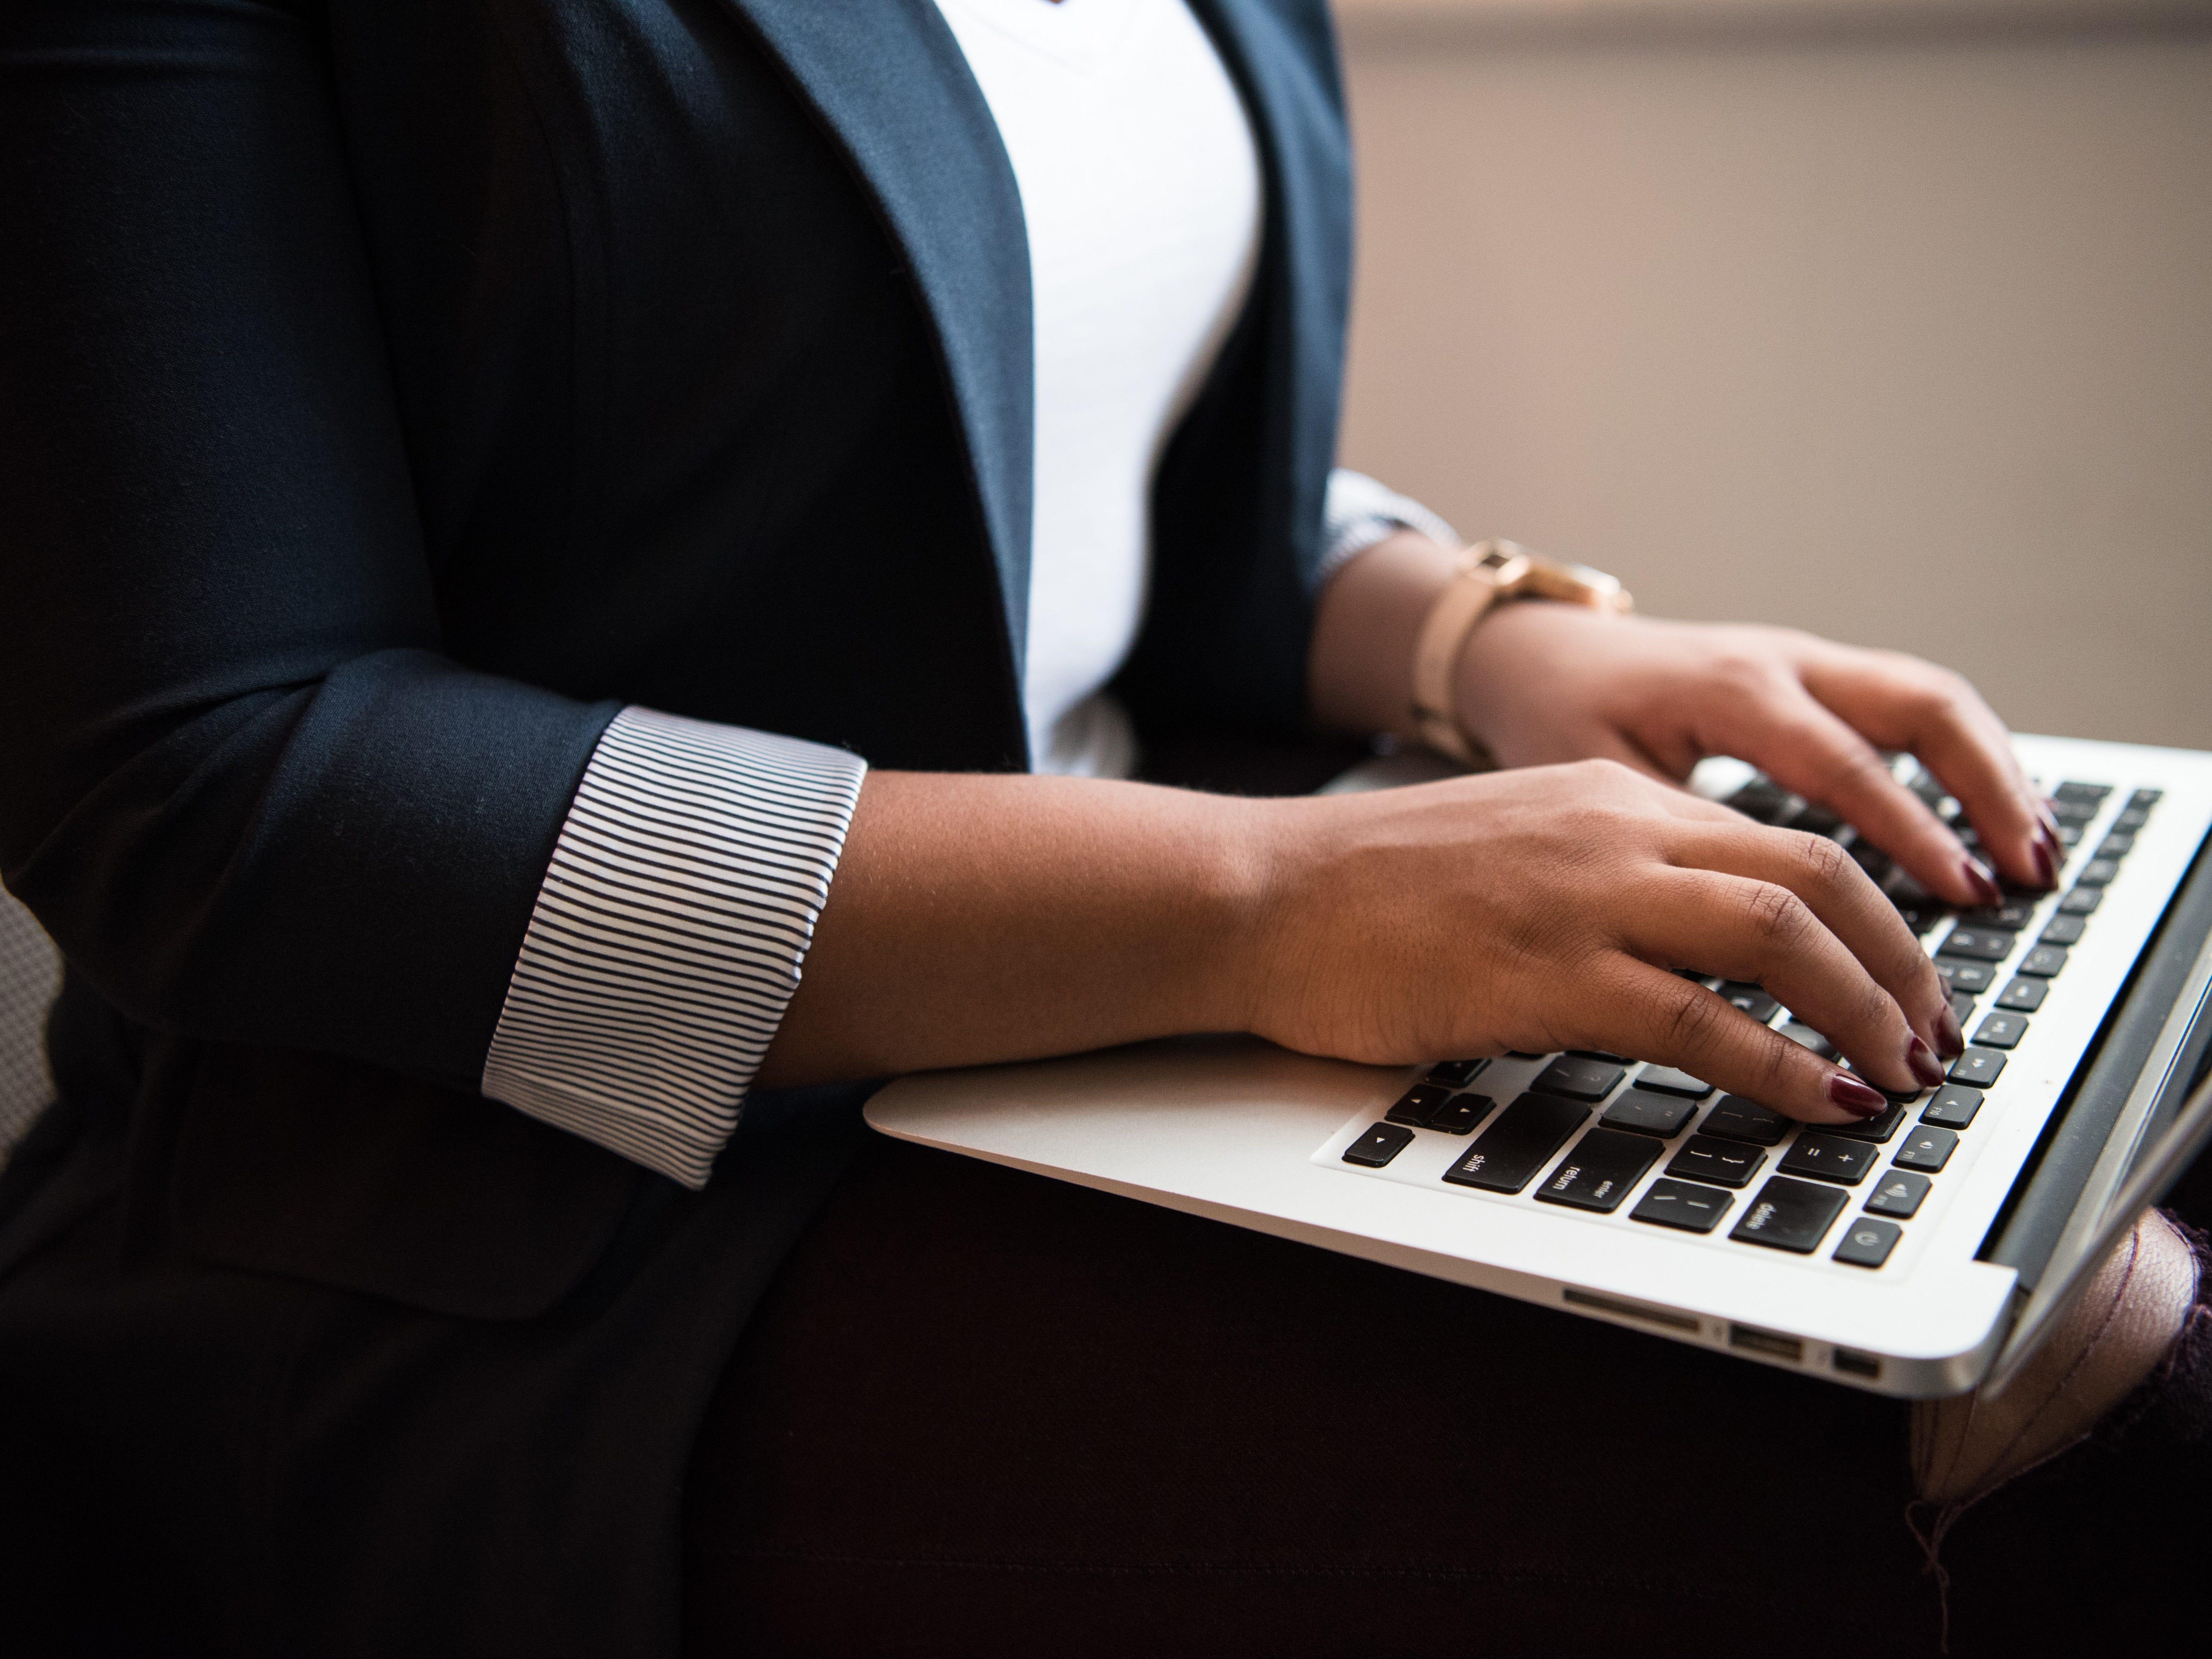 Equal Pay Day 2019: Arizona women make 15 cents per dollar less than men